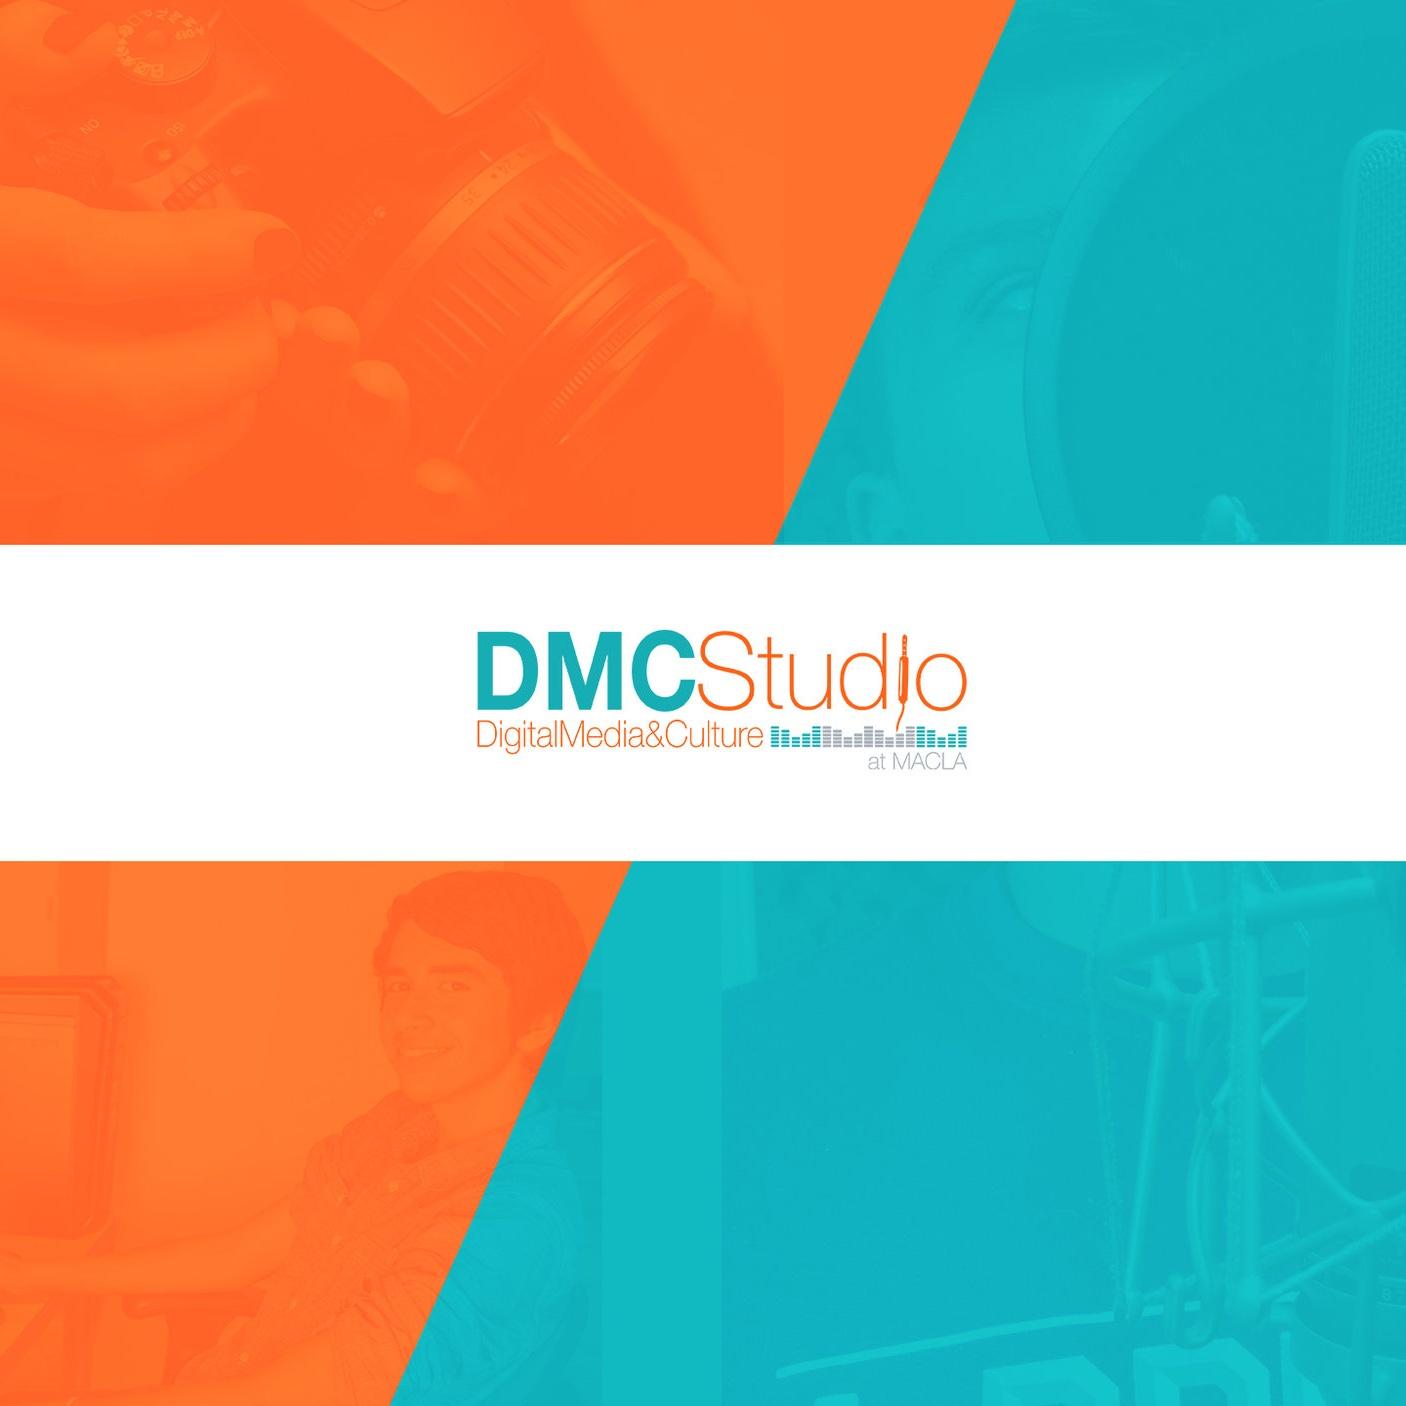 DMC-Studio-Youtube-cover2.jpg